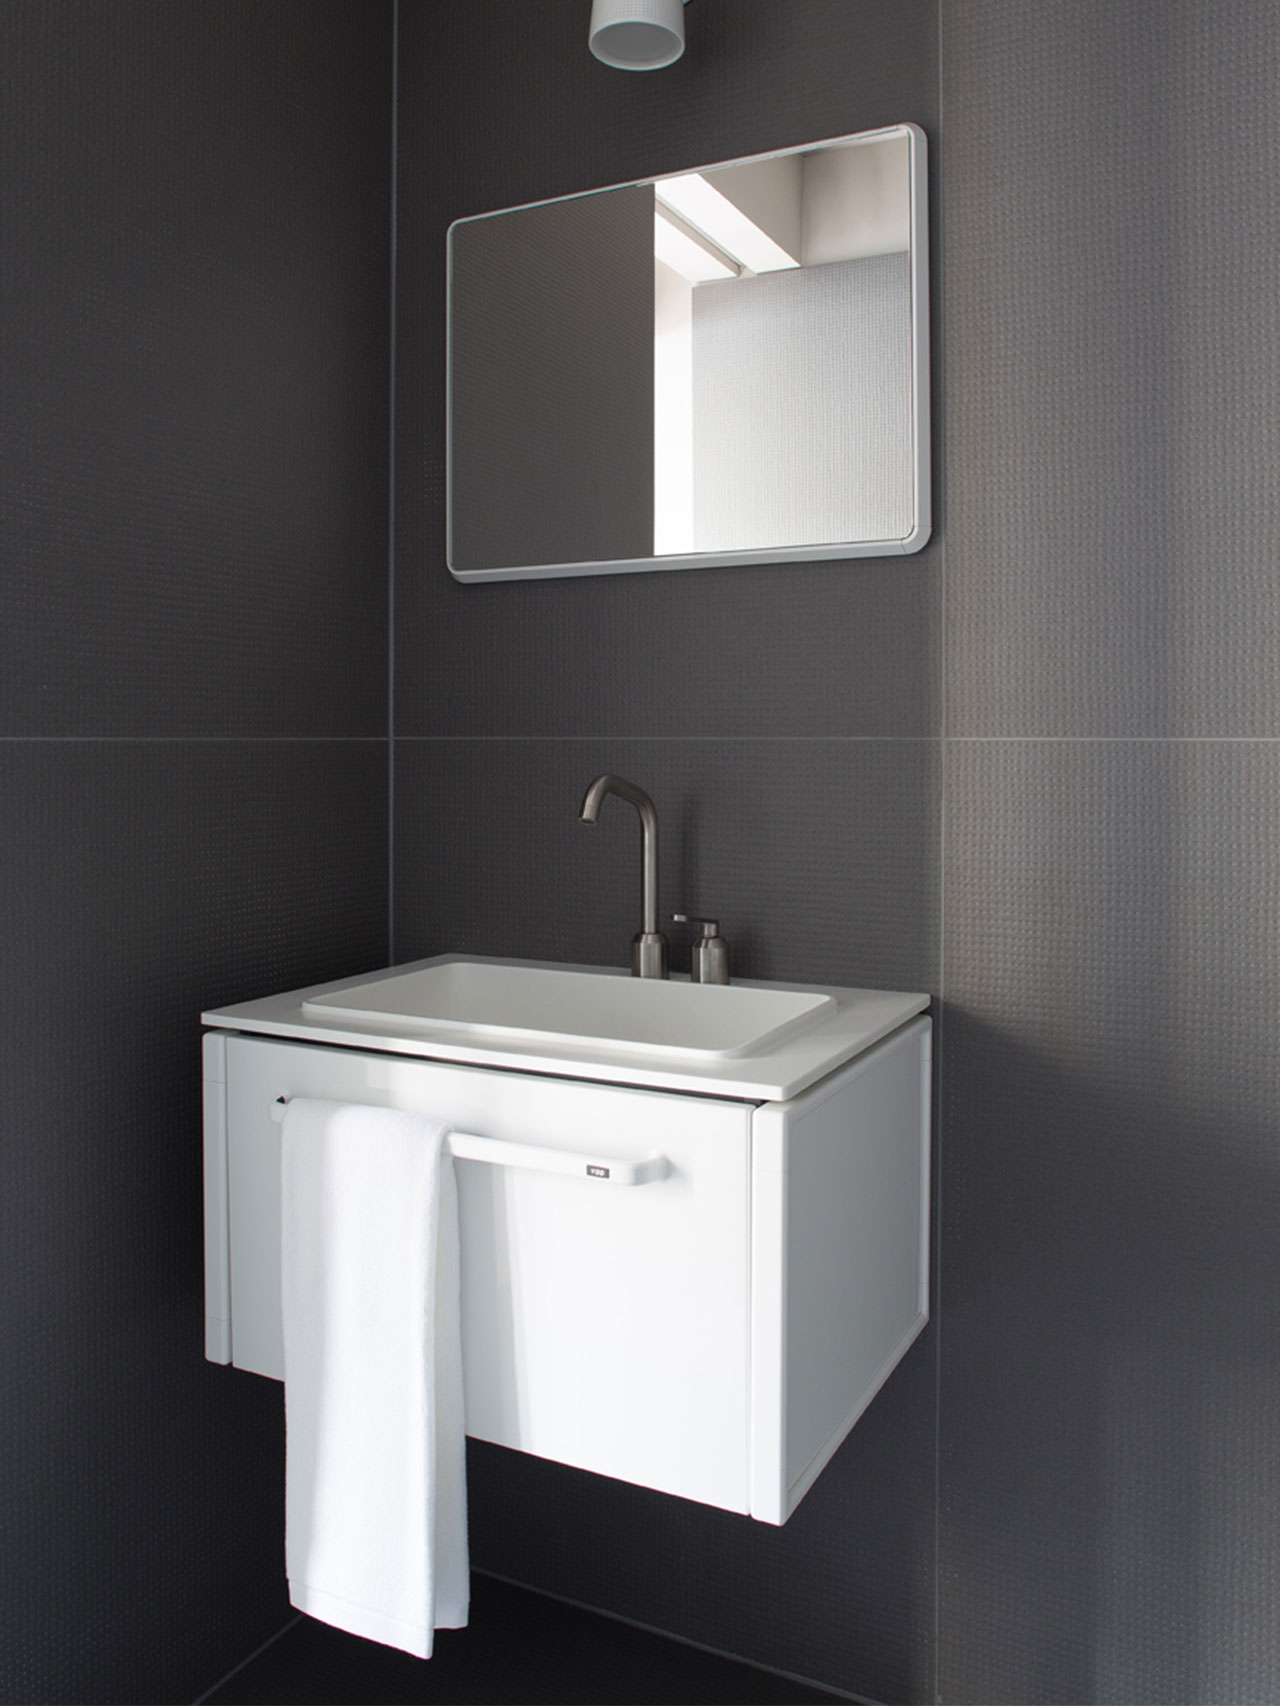 vipp badeværelse Badmodul, small | vipp.com vipp badeværelse